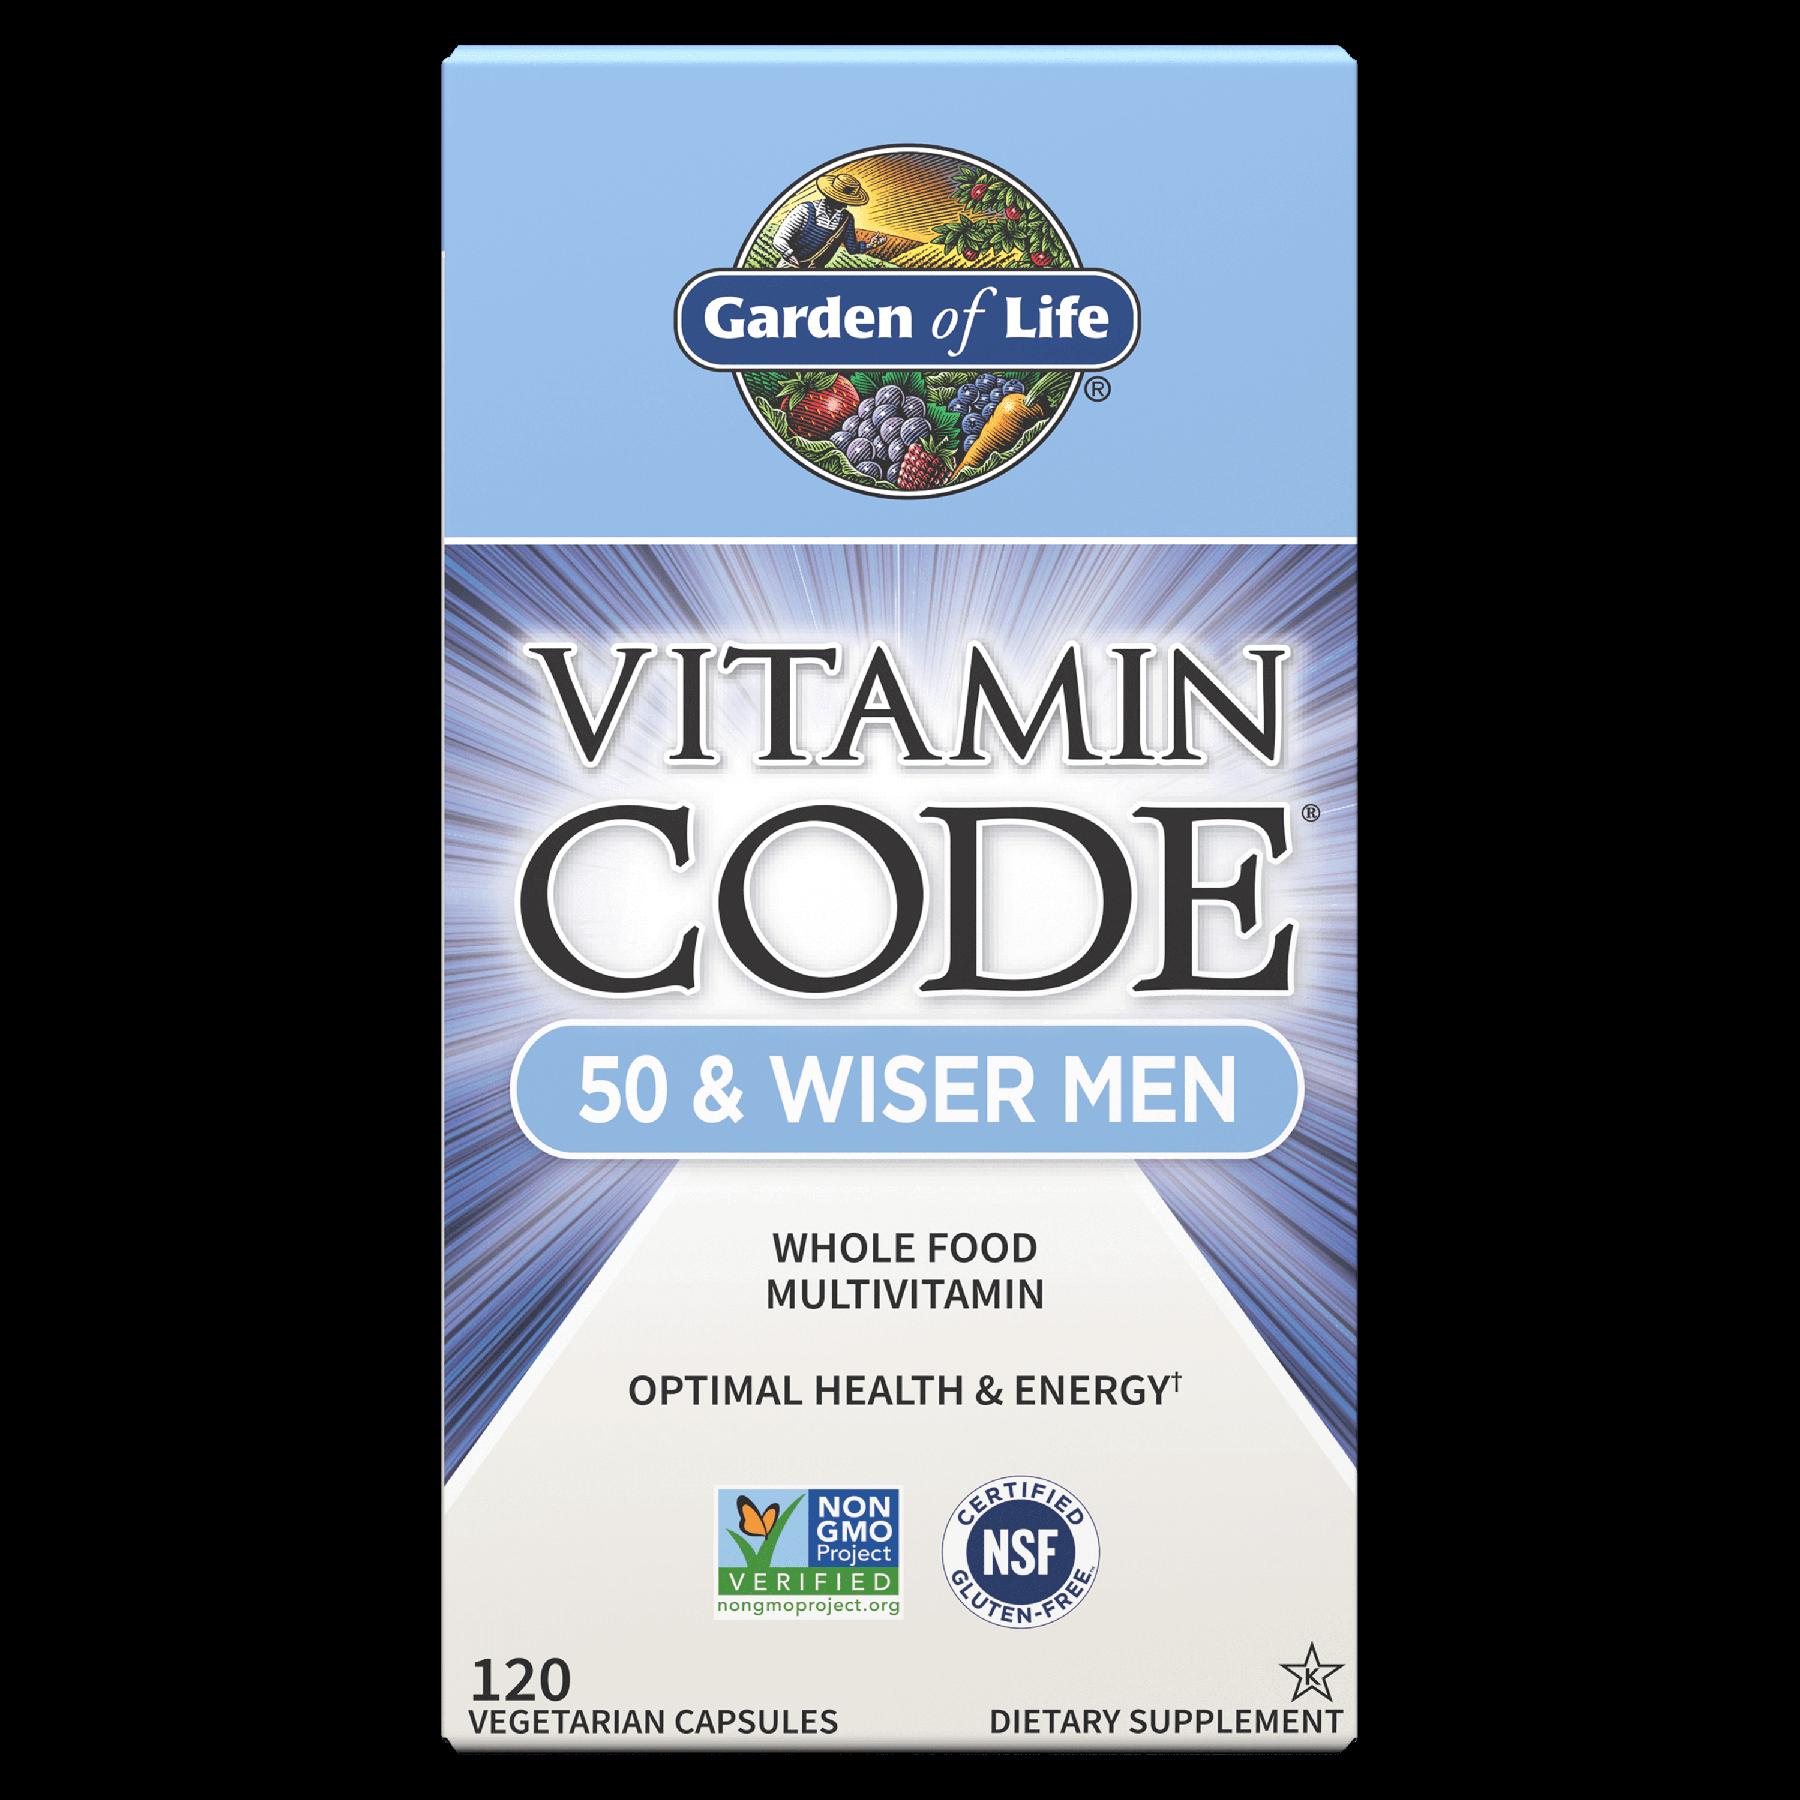 Vitamin Code 50 & Wiser Men